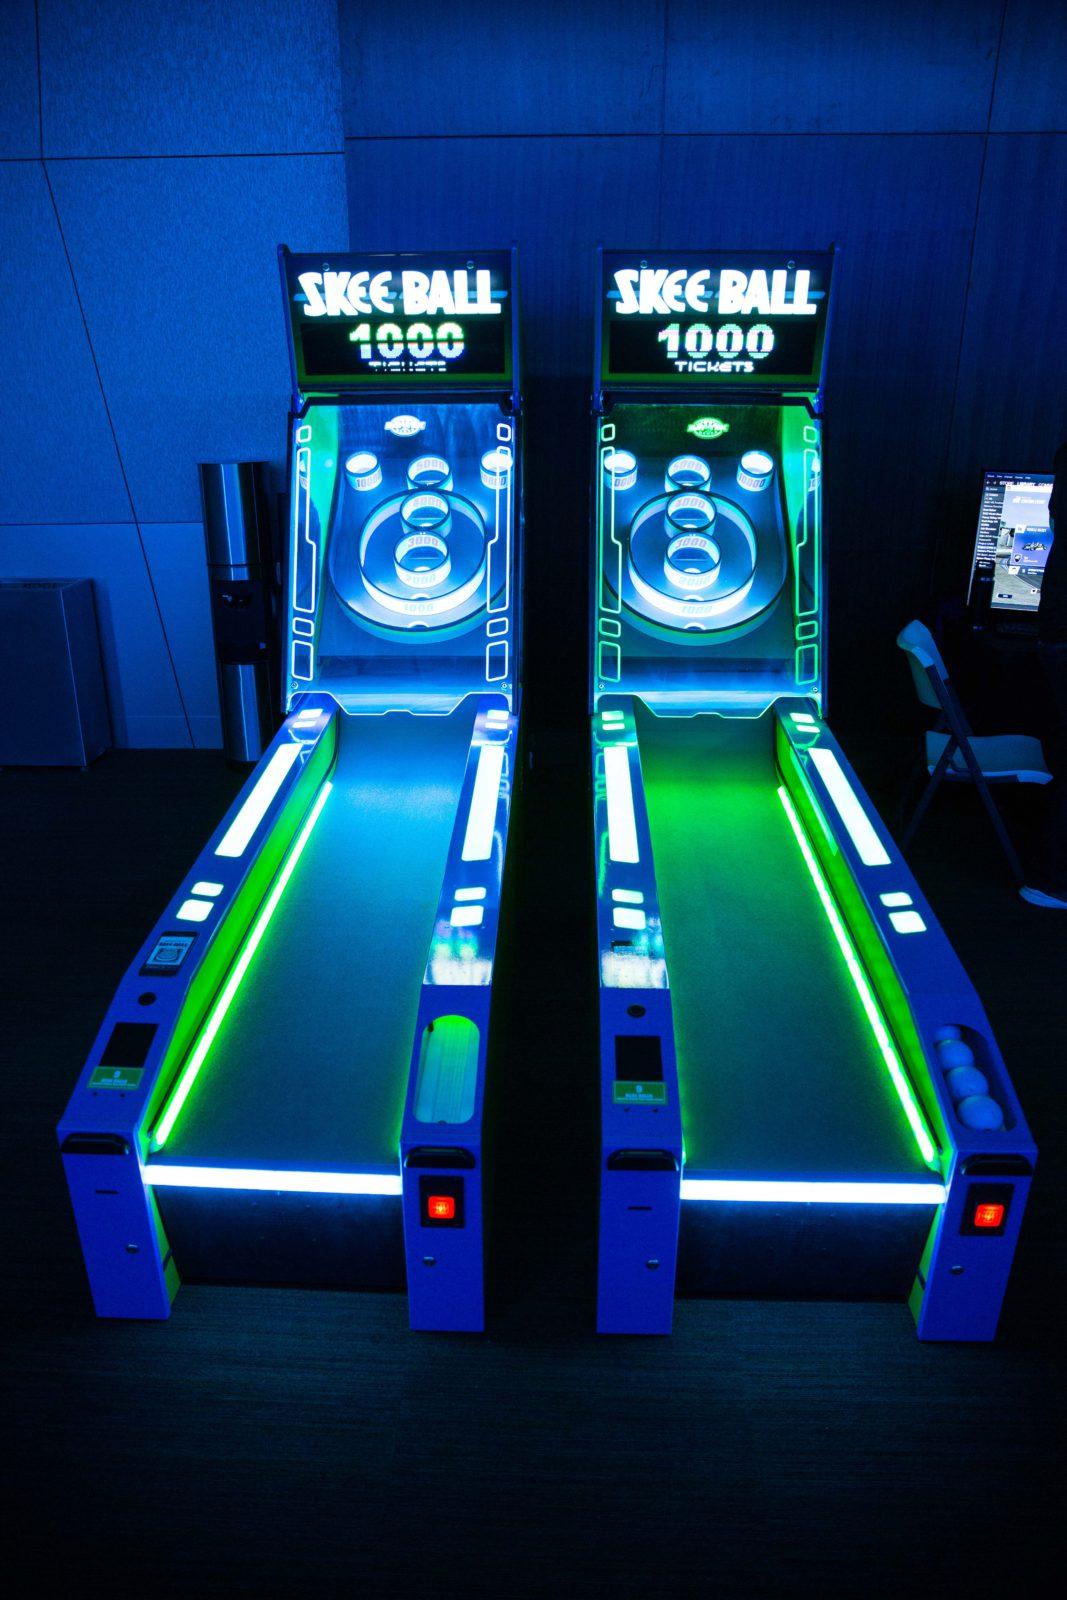 glow in the dark arcade games